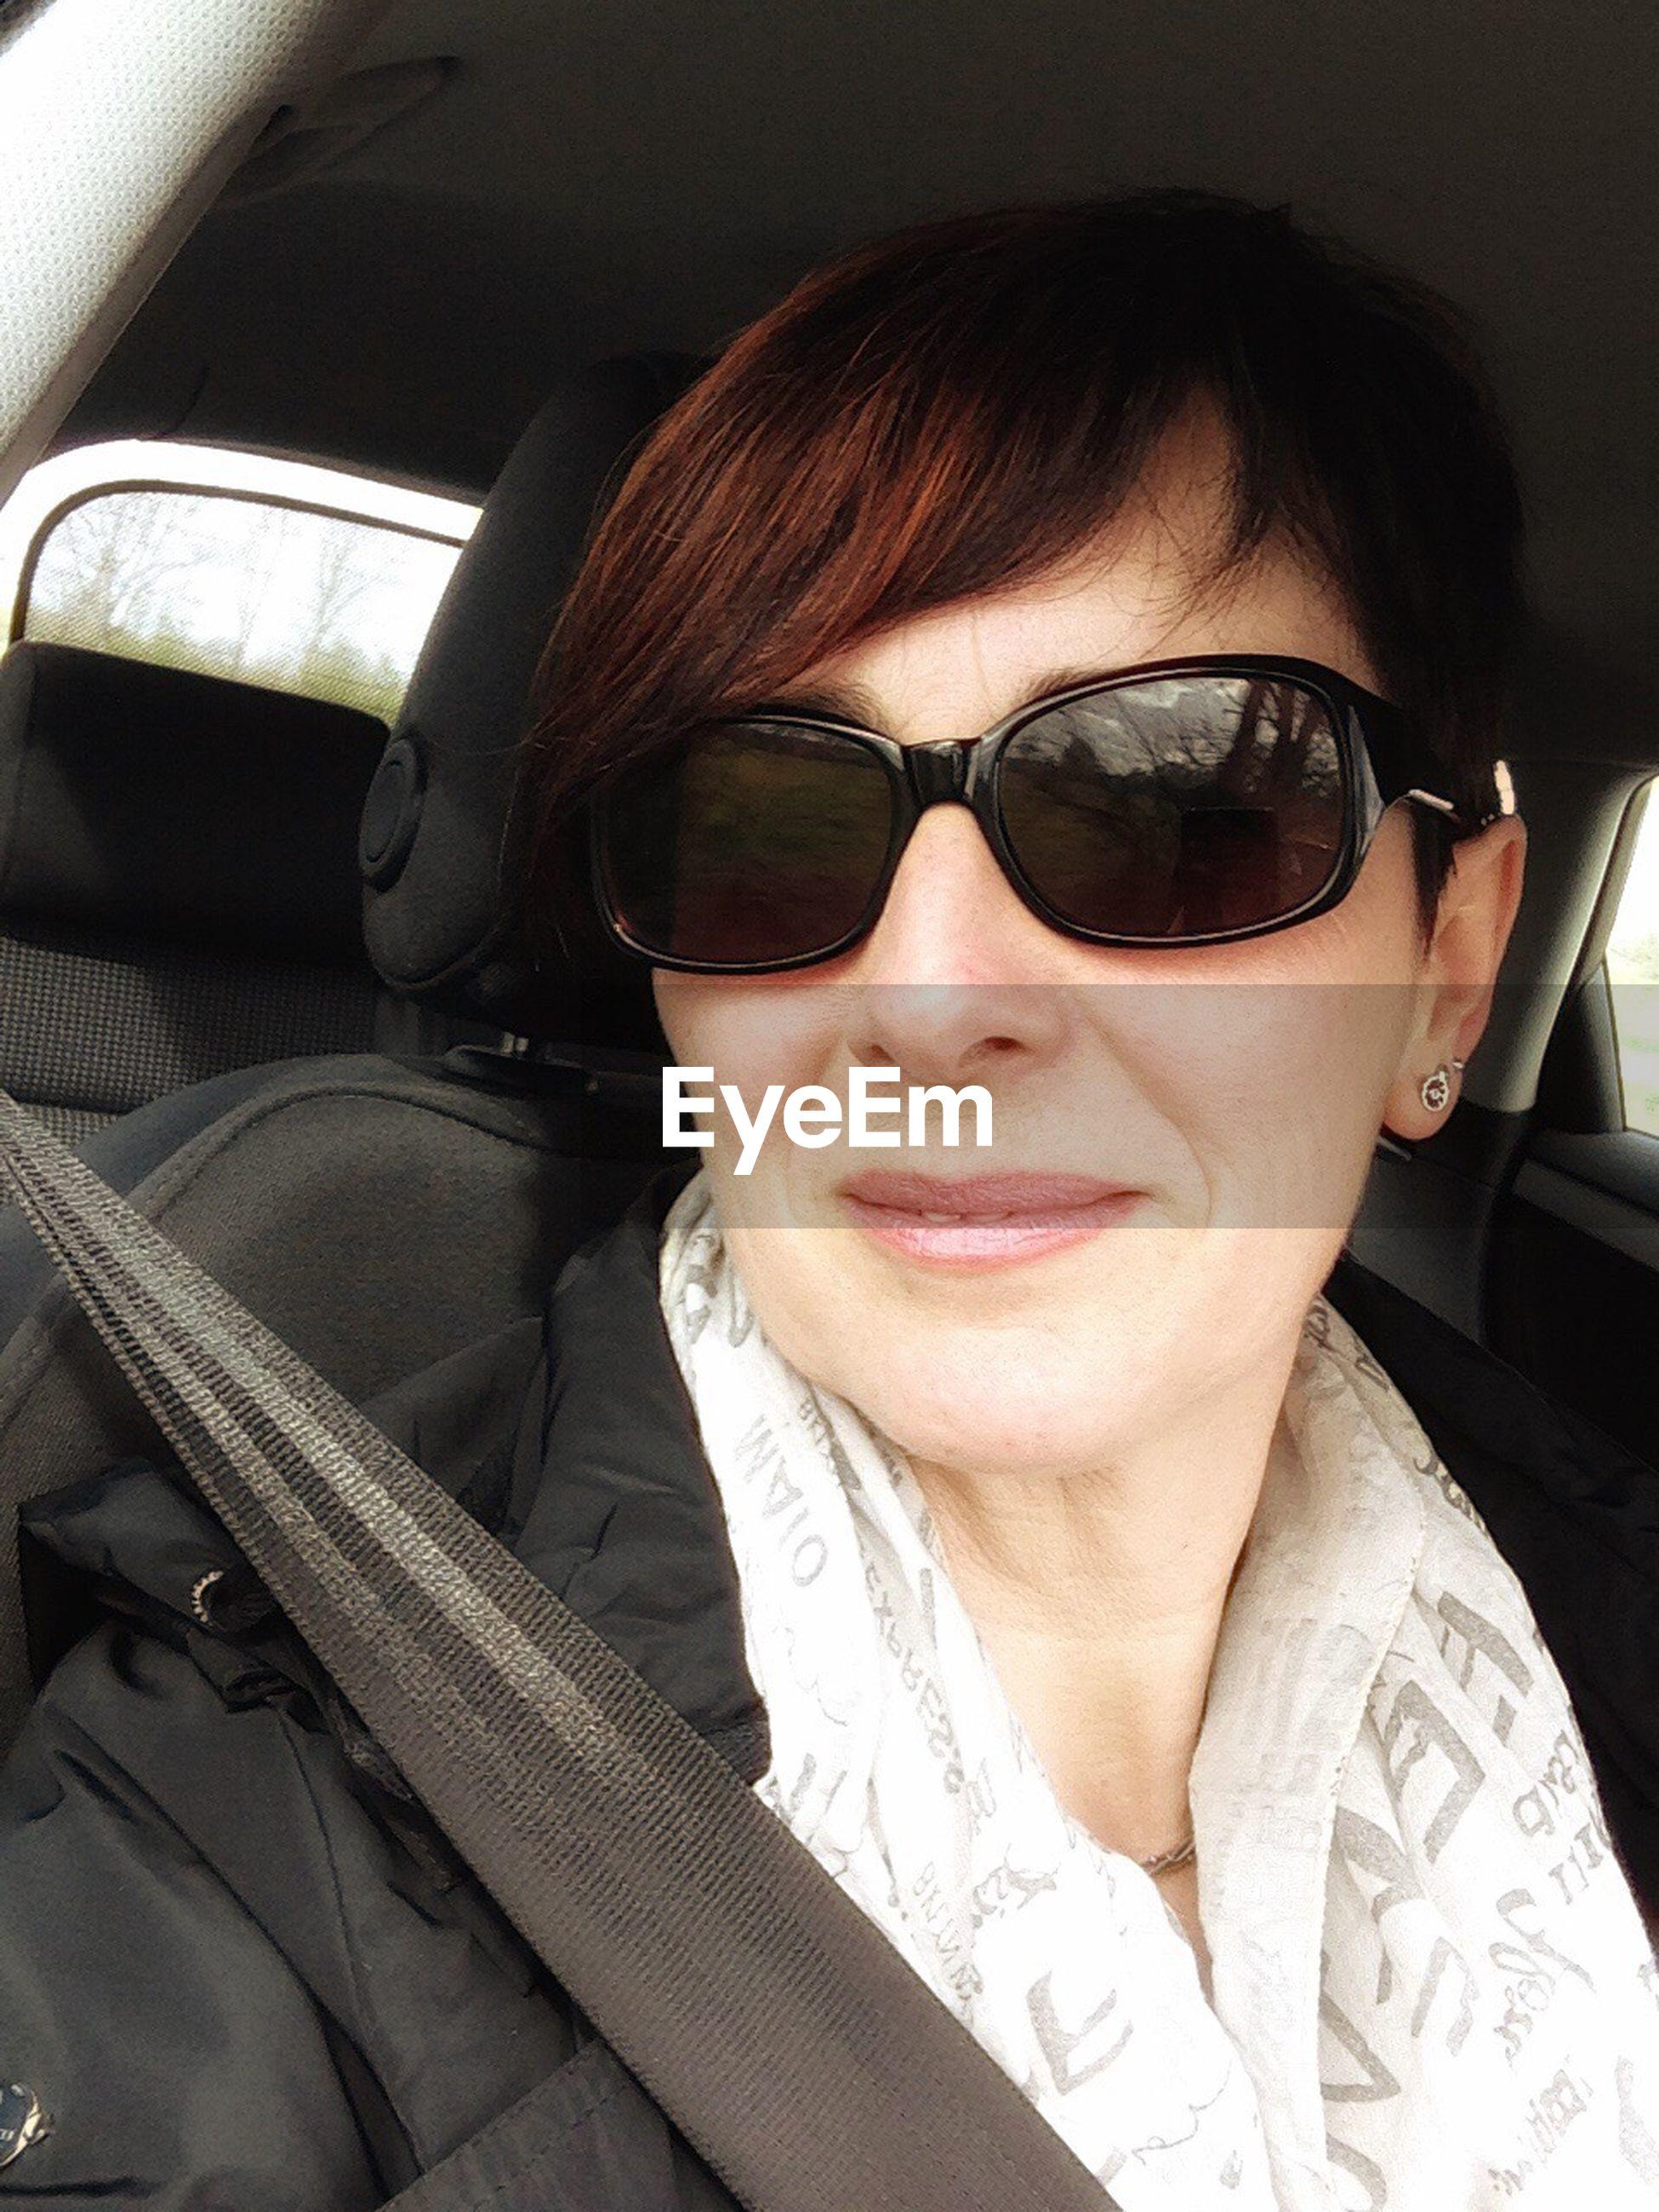 Woman wearing sunglasses driving car